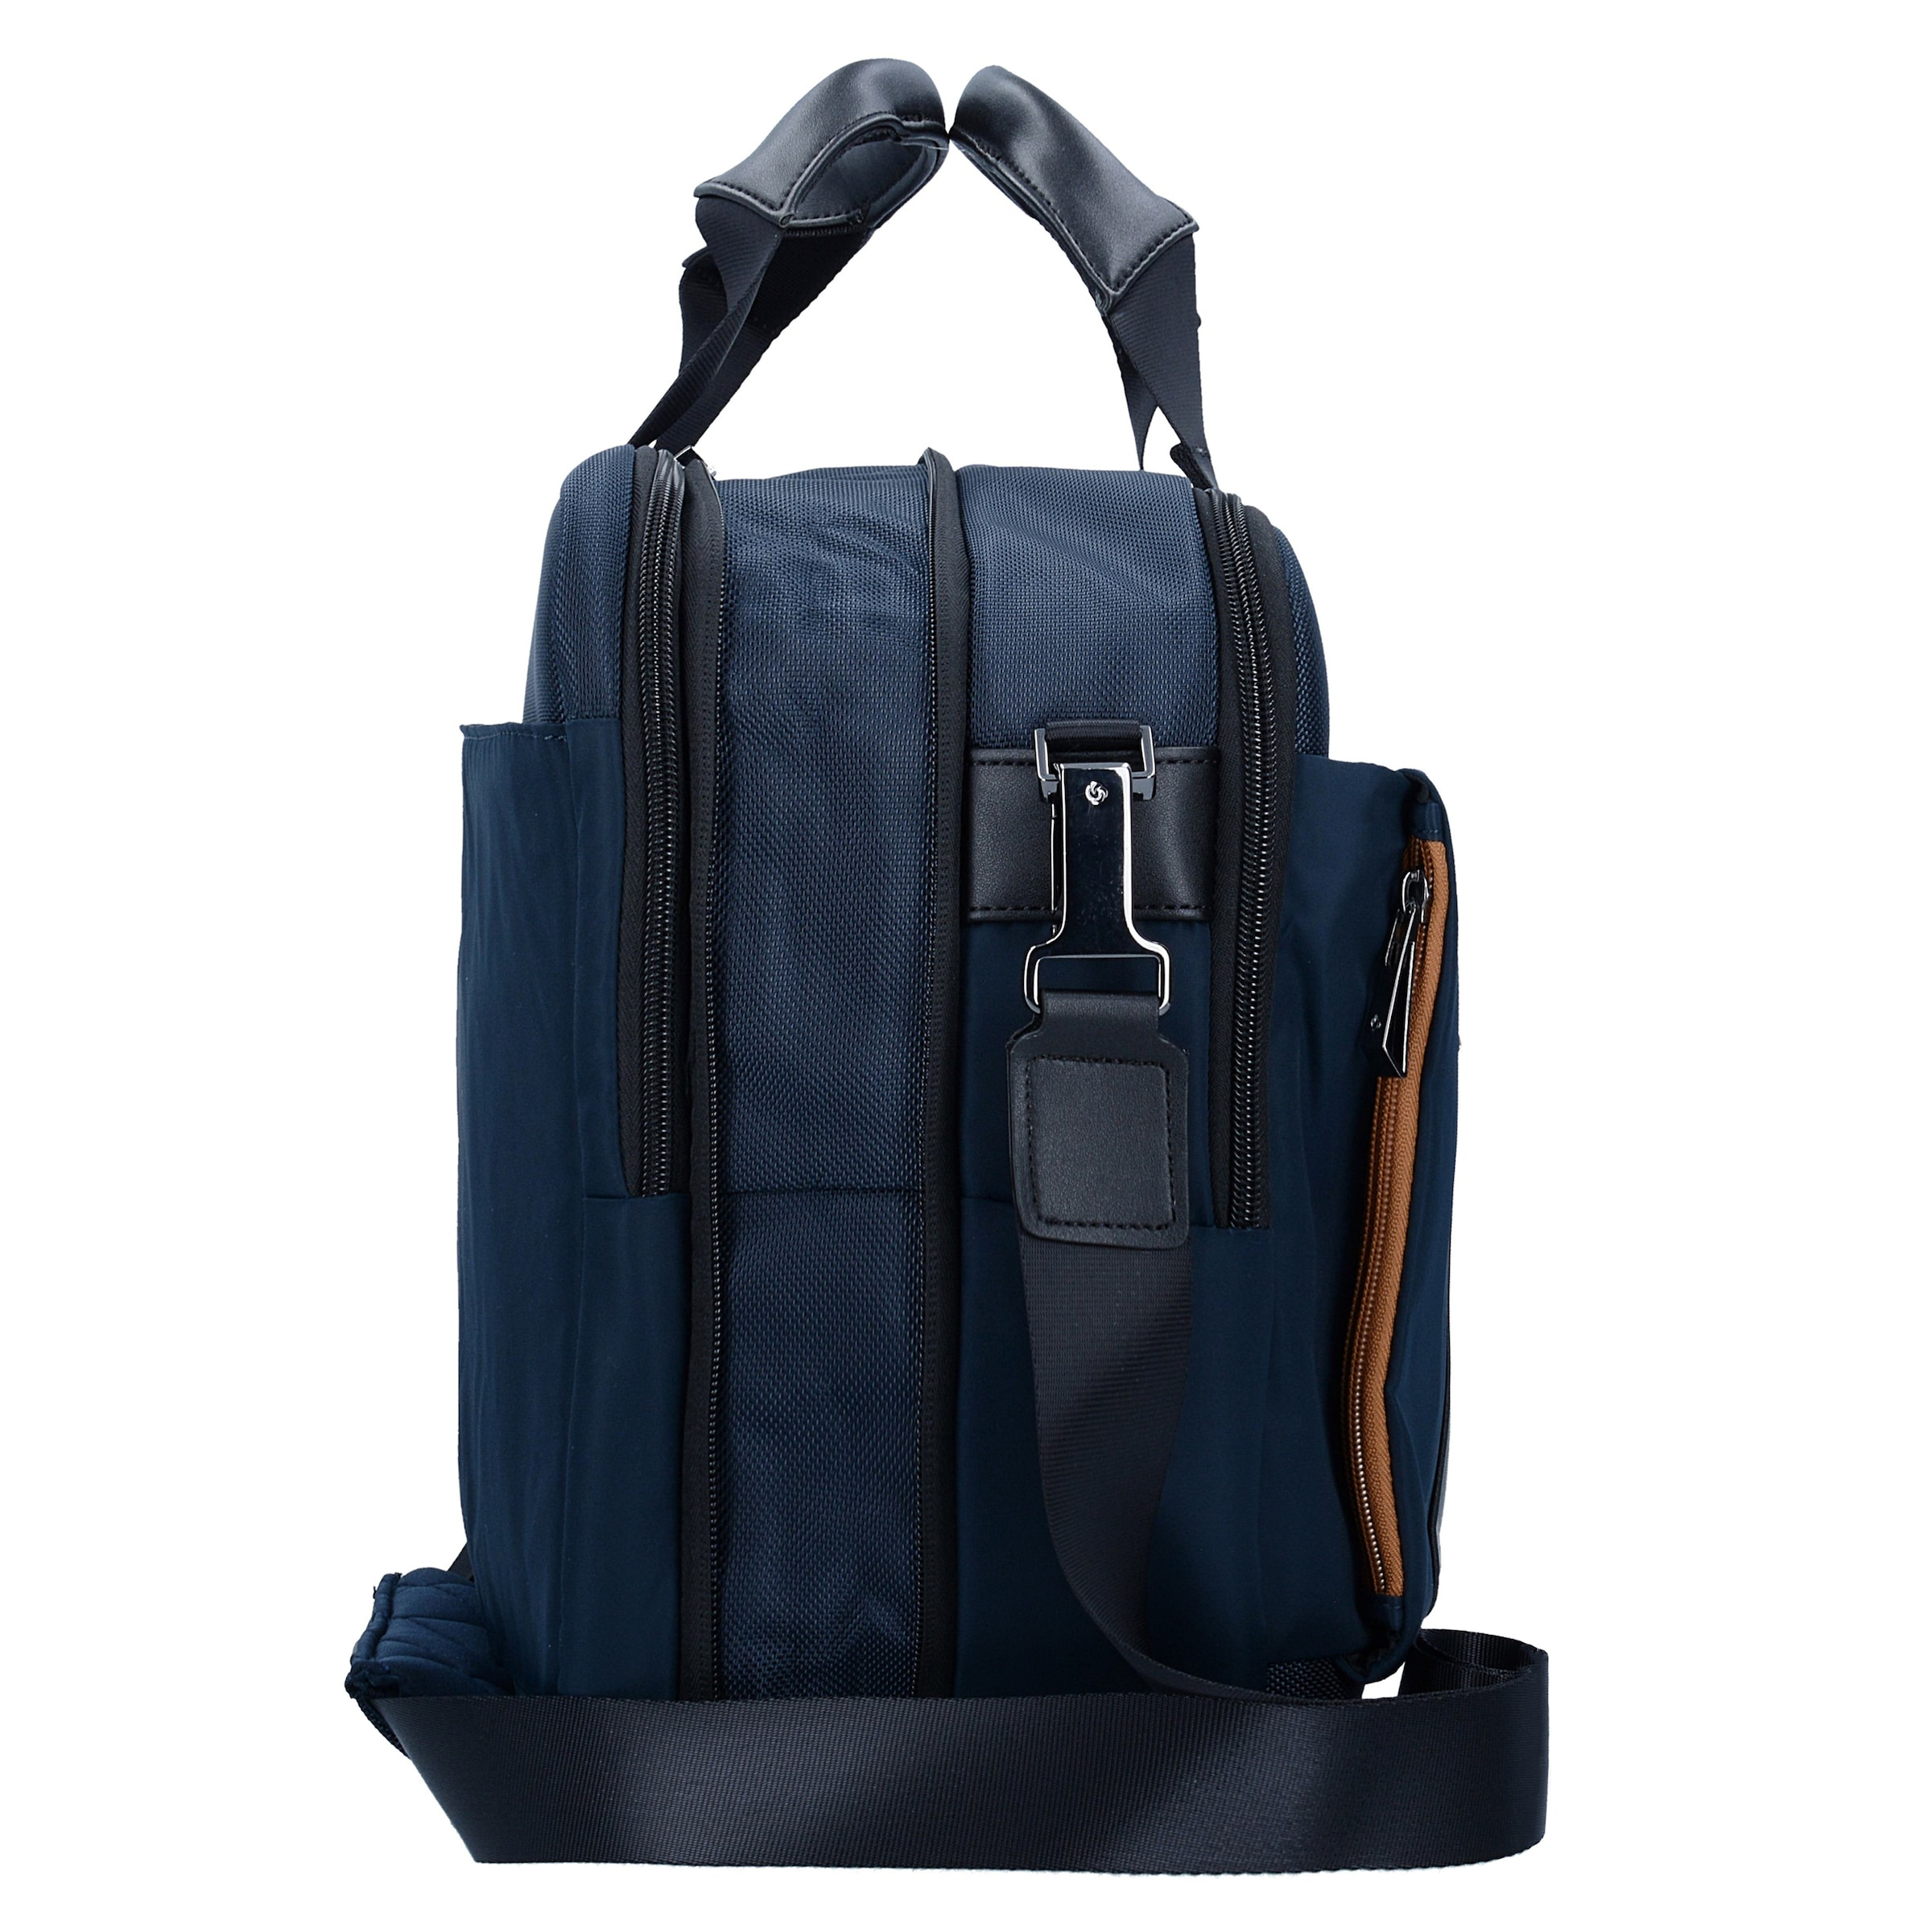 Perfekt SAMSONITE Openroad Aktentasche Leder 45 cm Laptopfach Factory-Outlet-Online Nicekicks Rabatt Großer Verkauf Mit Paypal Bezahlen XCr6u7FO